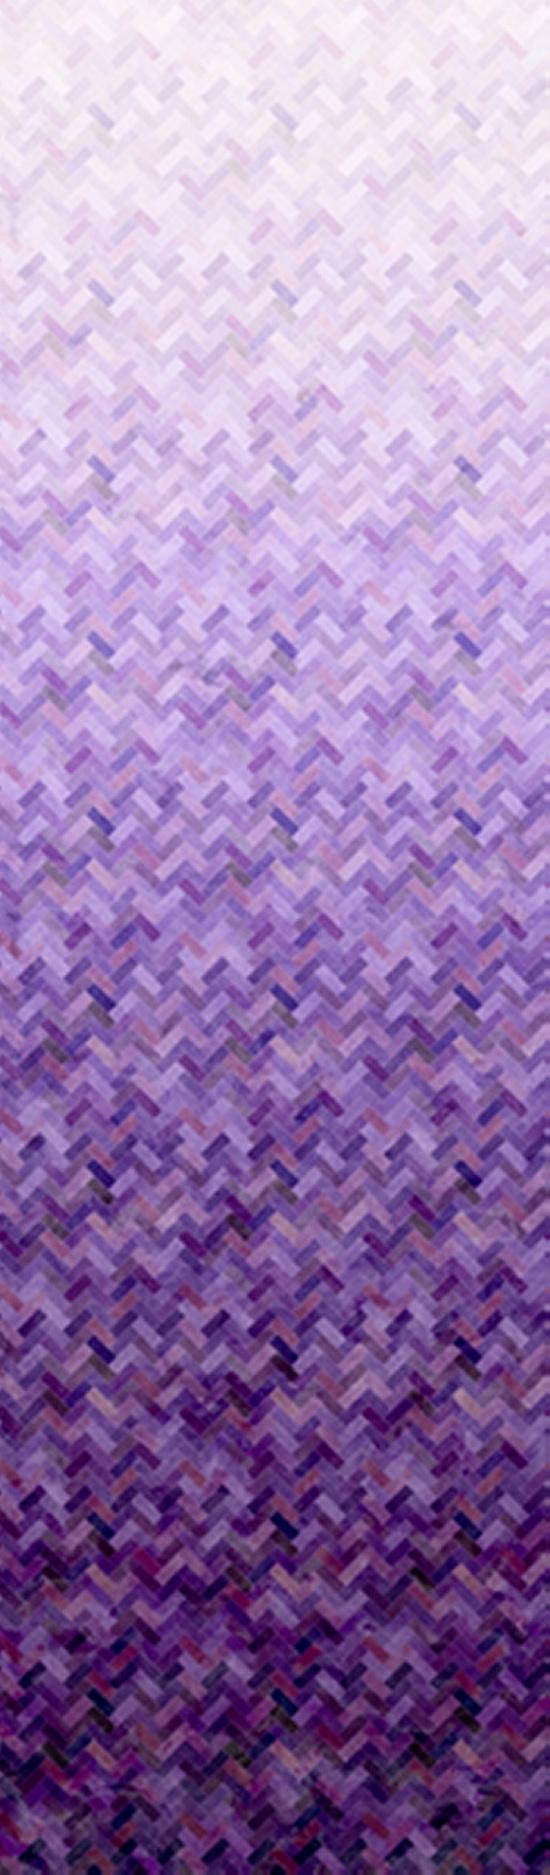 Backsplash Lavender - 4650-70